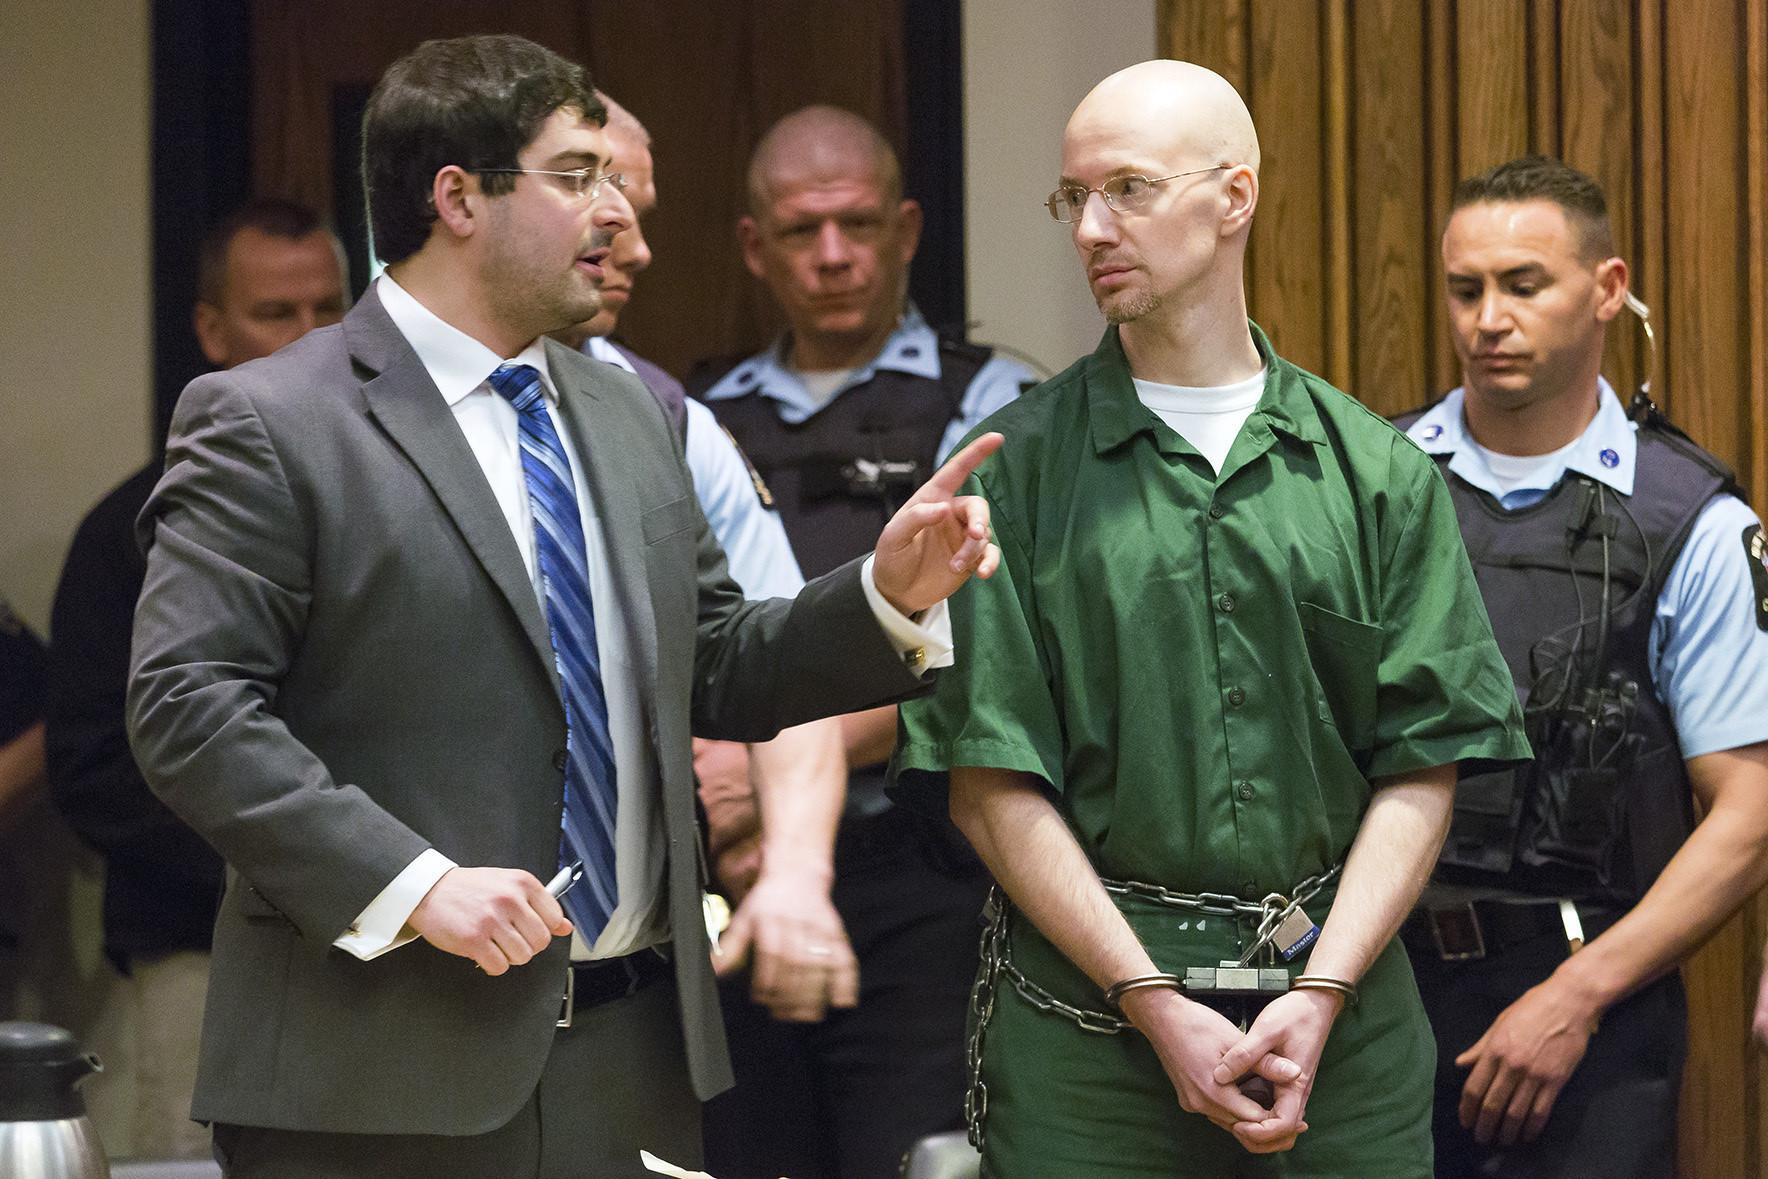 ny prison escape david sweat gets more prison time 80k bill for escape chicago tribune. Black Bedroom Furniture Sets. Home Design Ideas